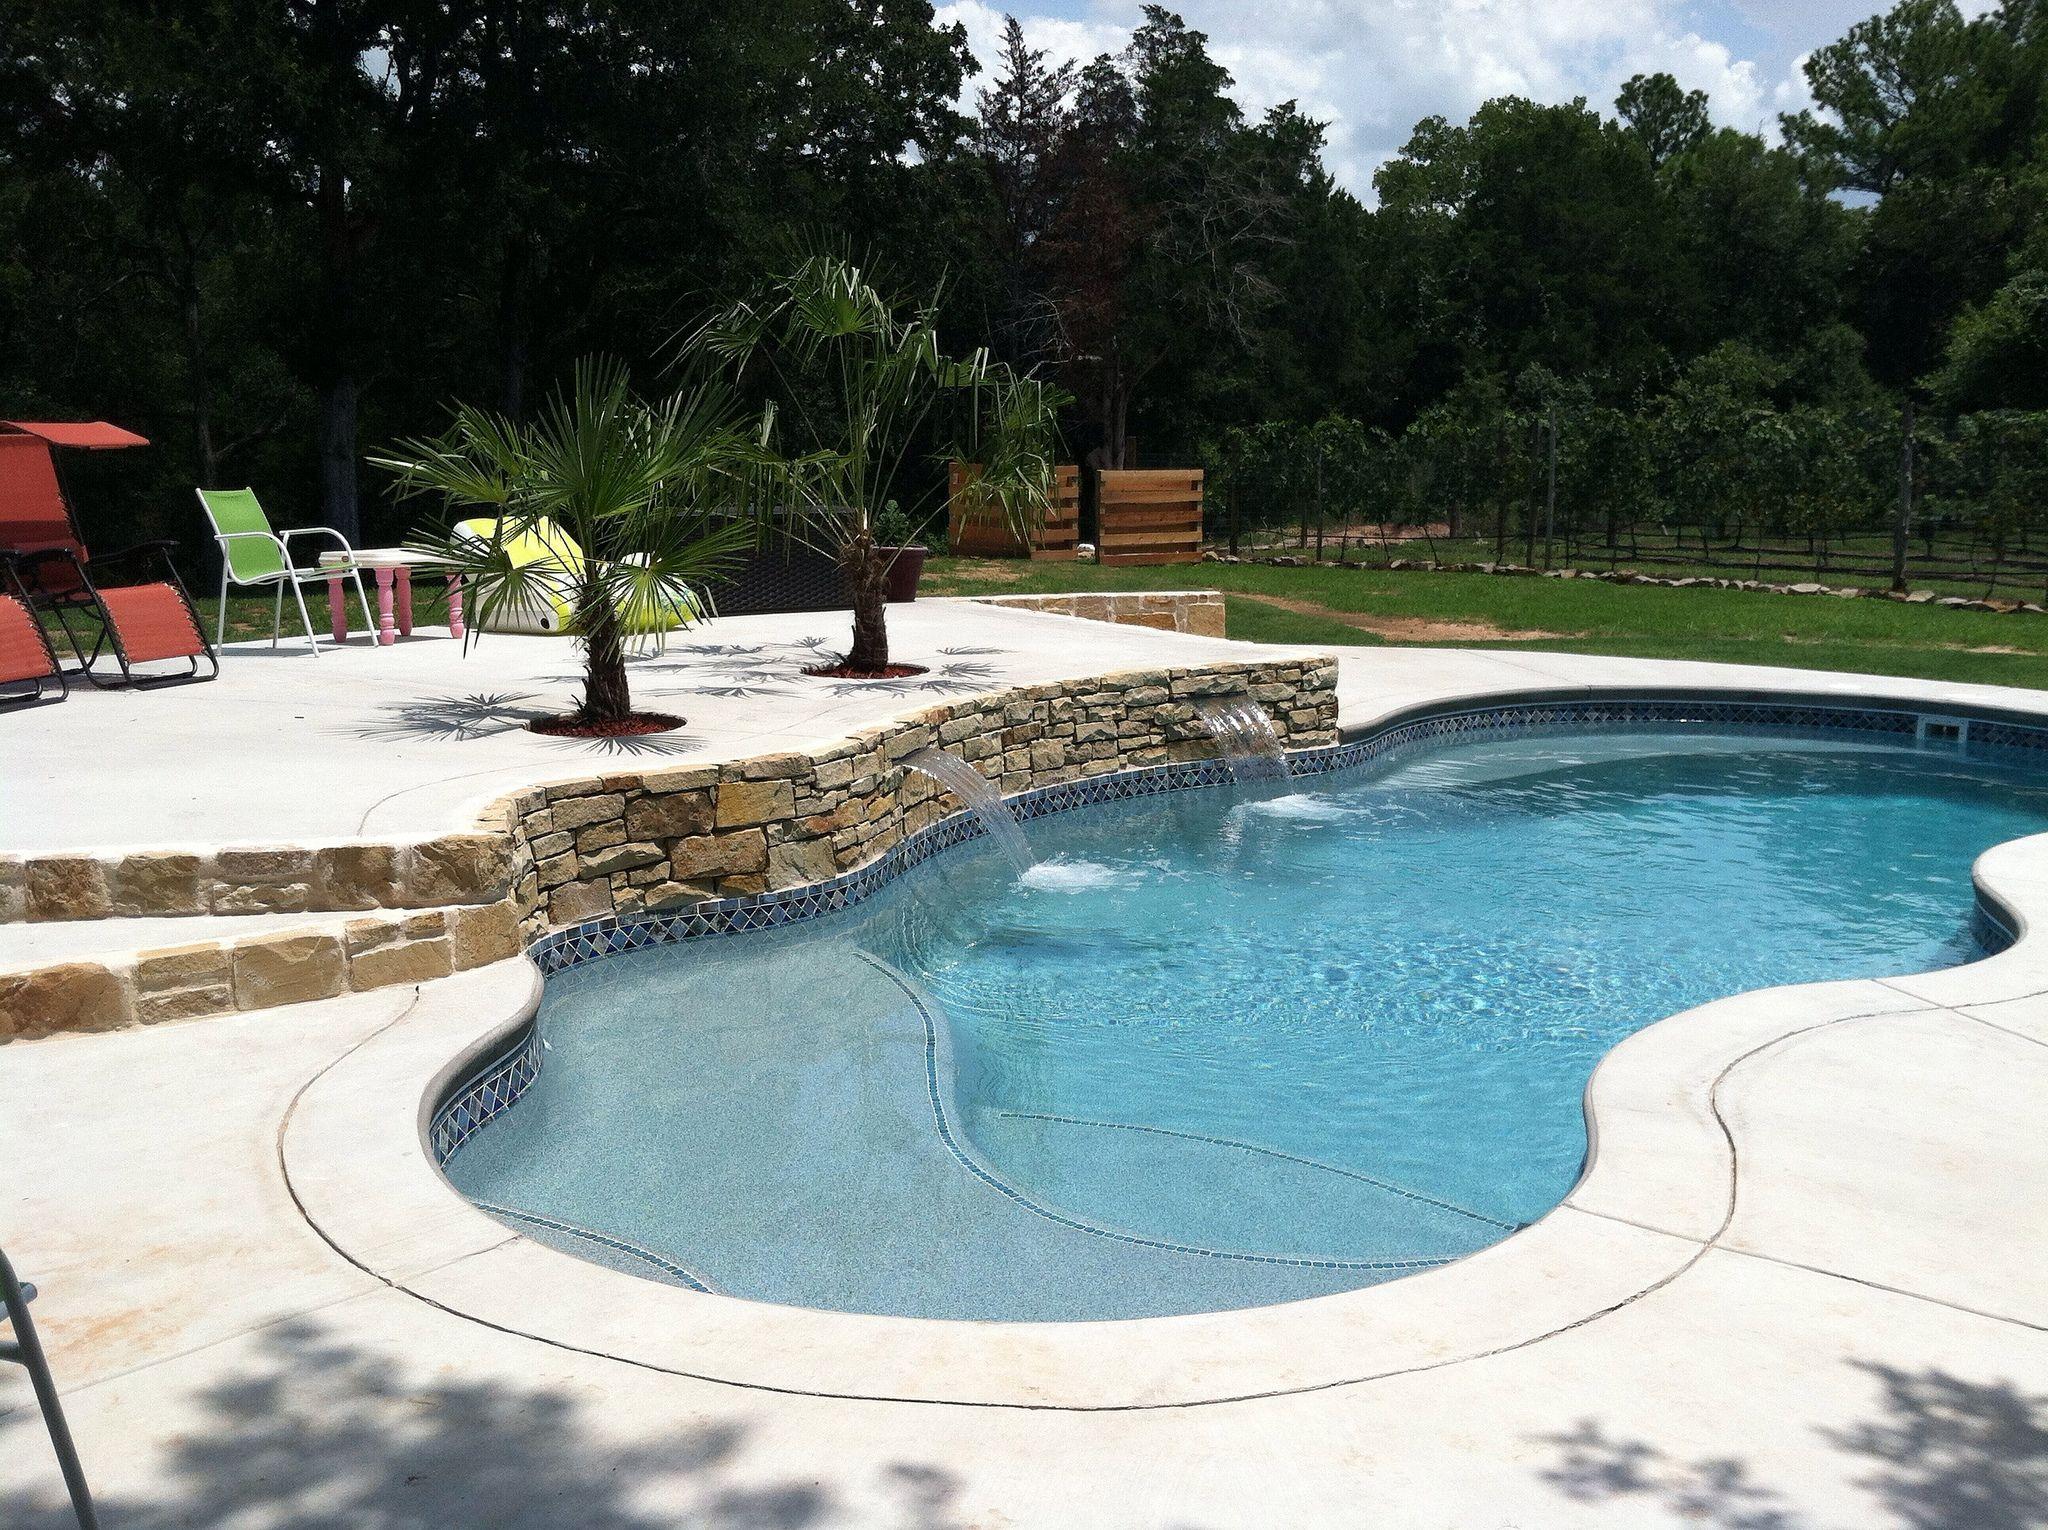 Fiji Pool Patio Swimming Pool Designs Backyard Pool Landscaping